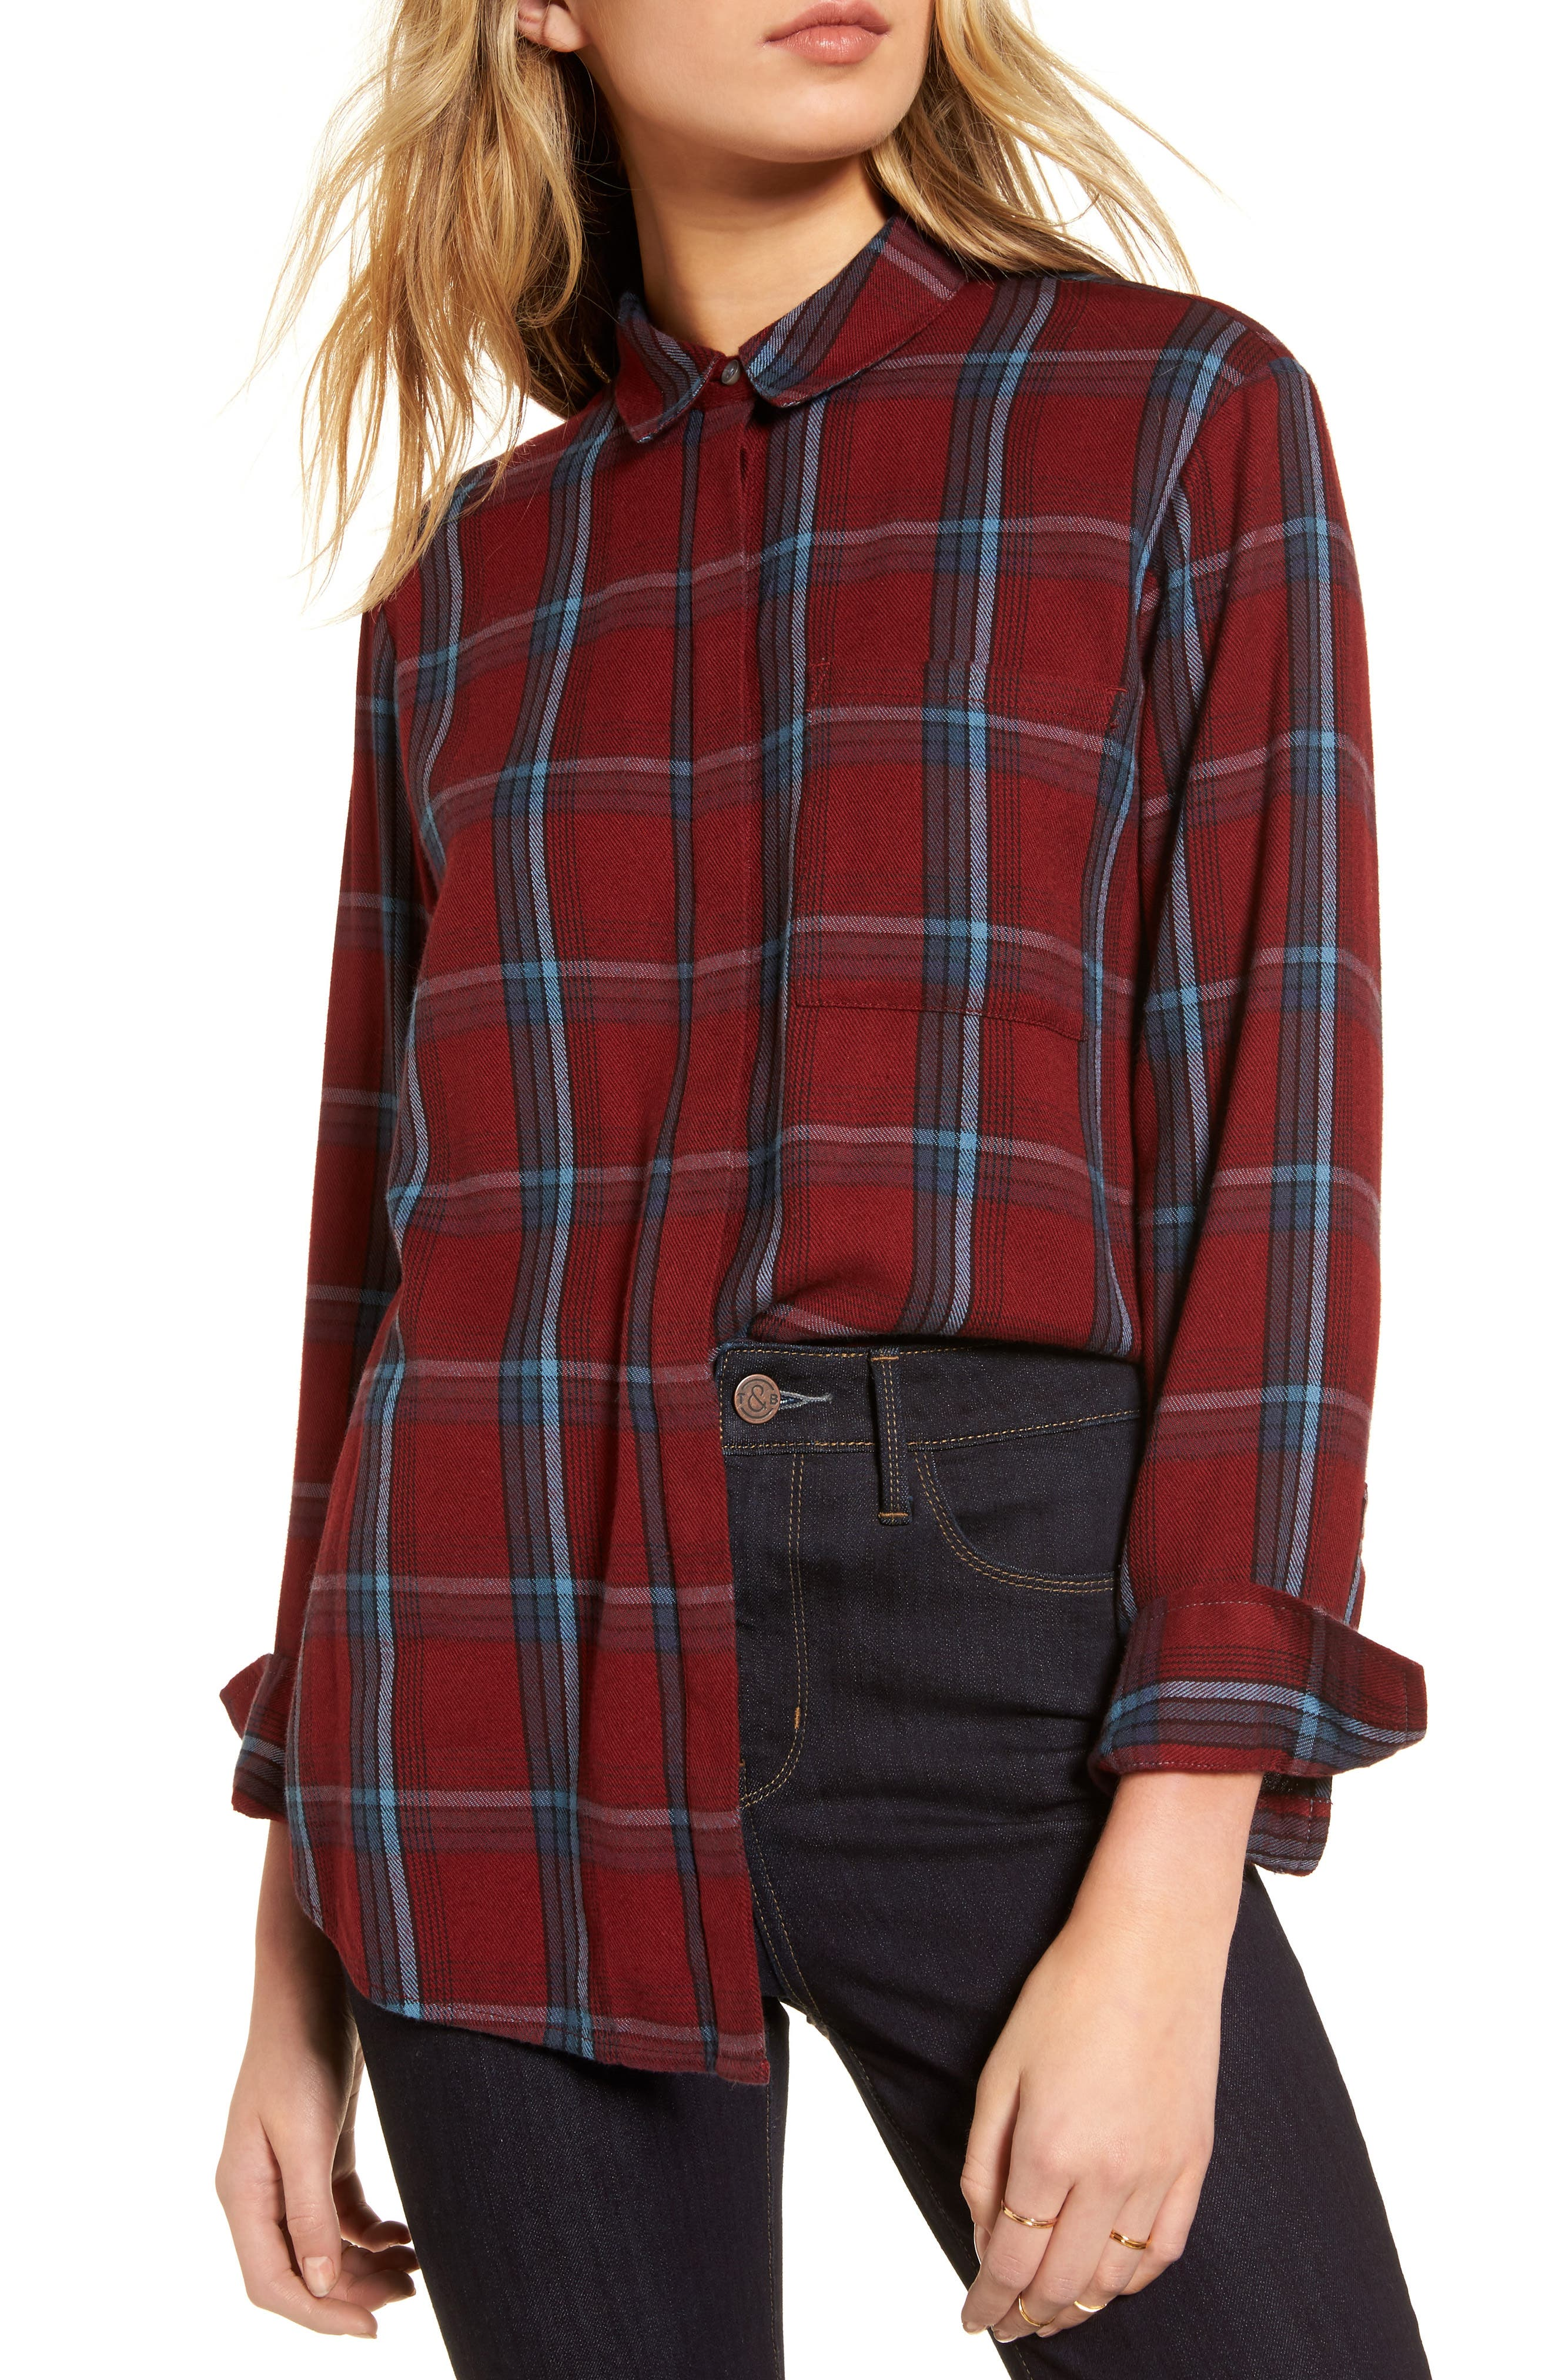 Ruffle Plaid Boyfriend Shirt,                             Main thumbnail 1, color,                             Red Syrah Three Box Tartan